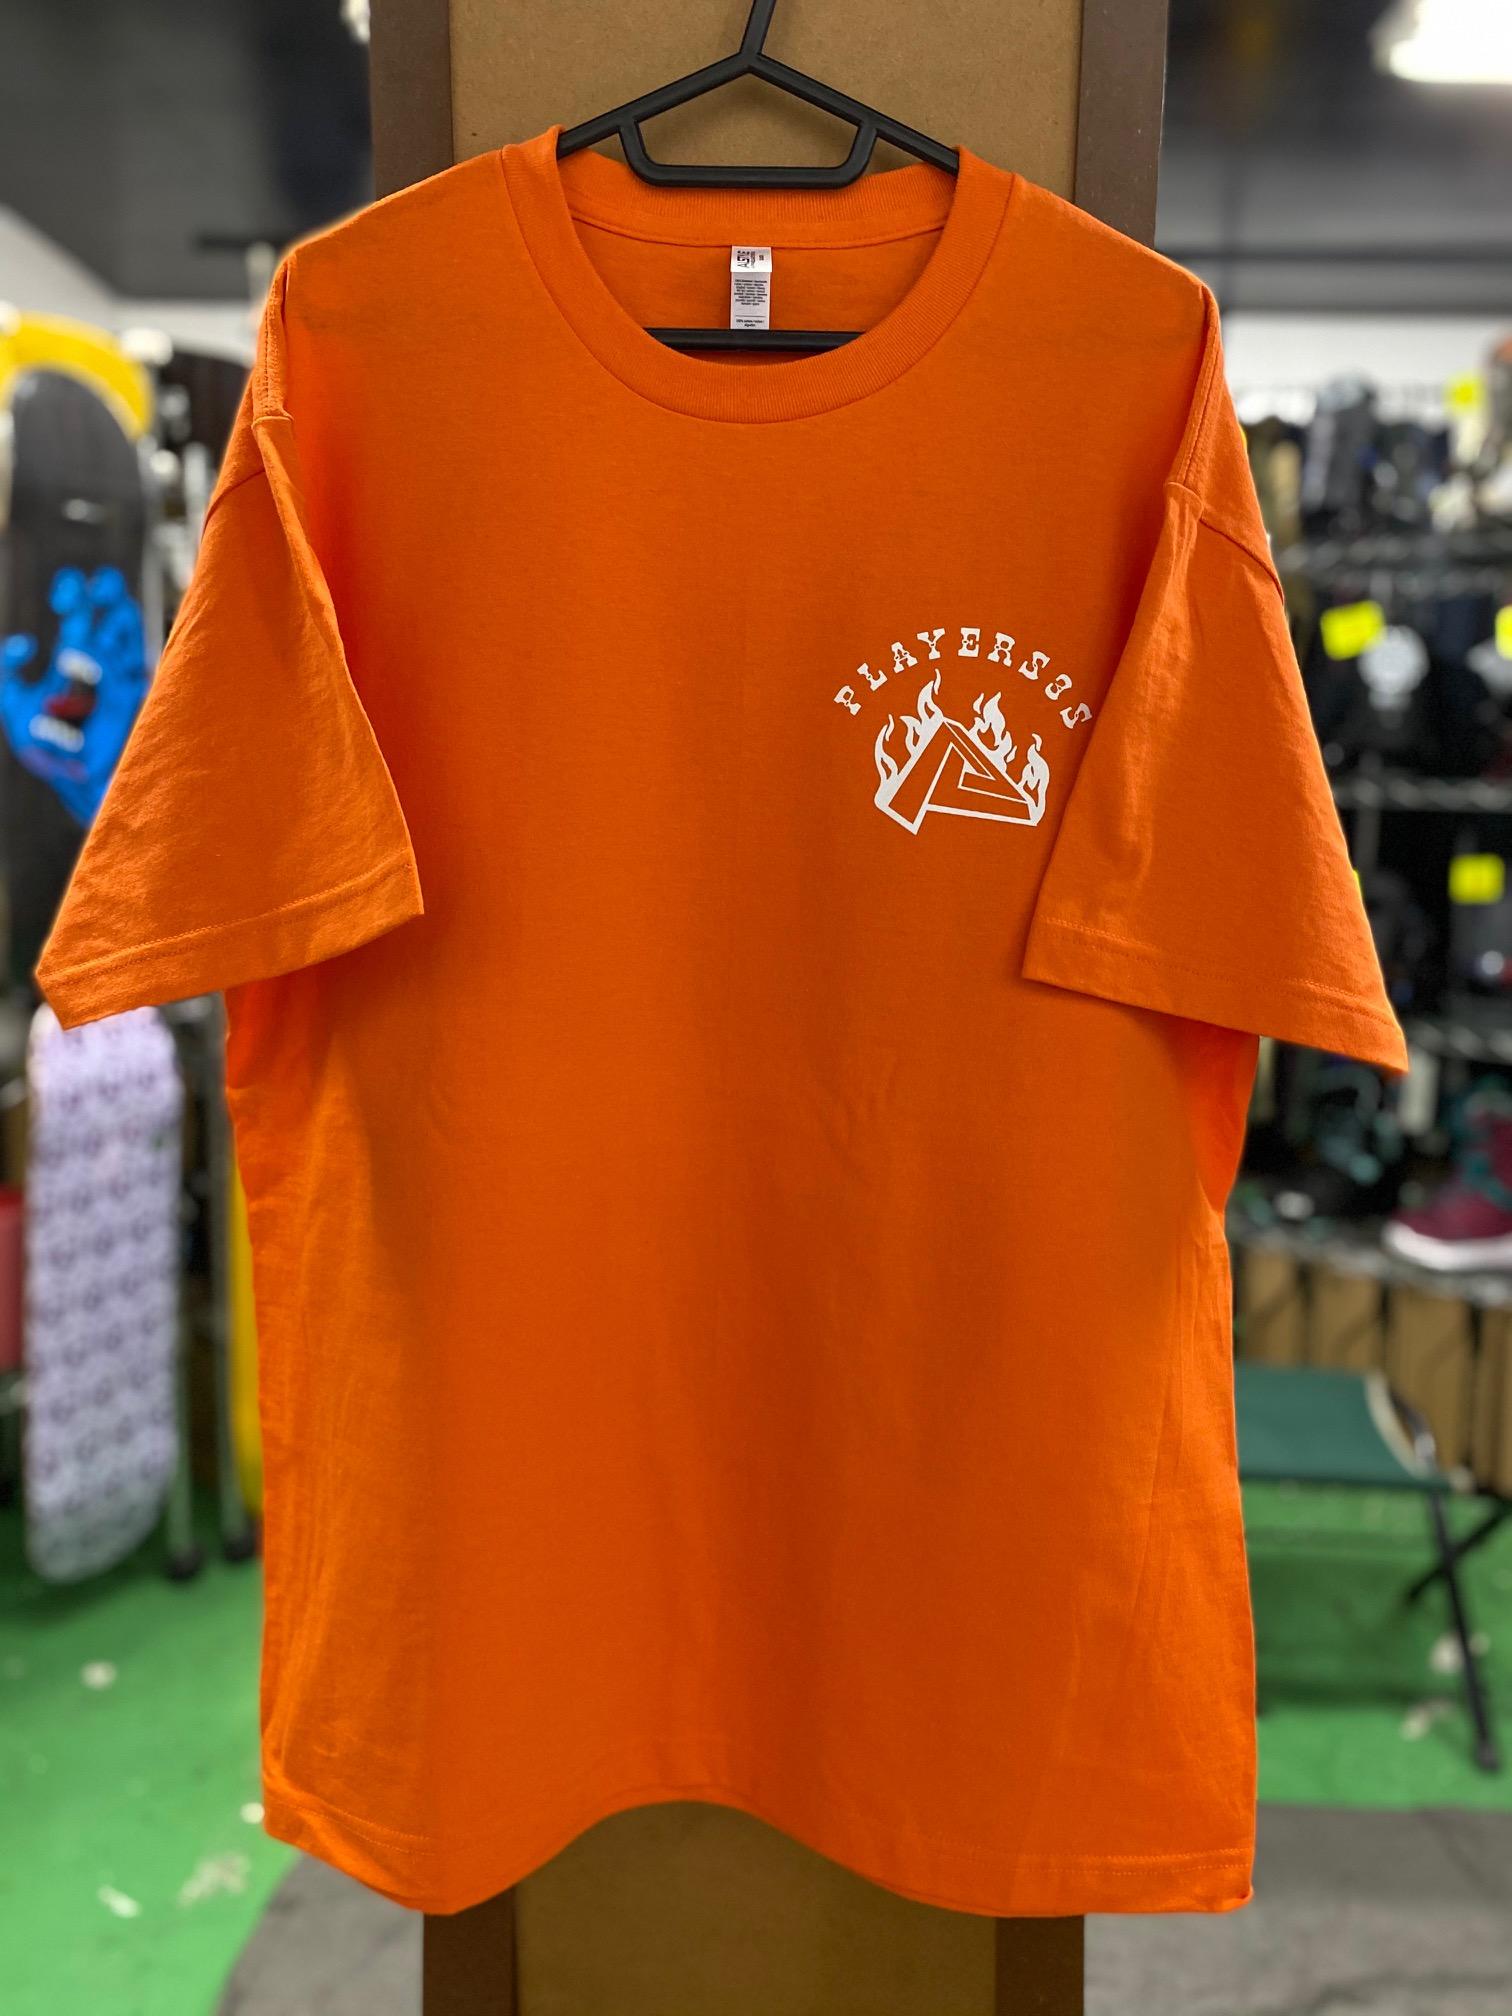 Players/3S 7周年限定Tシャツ入荷しました!!